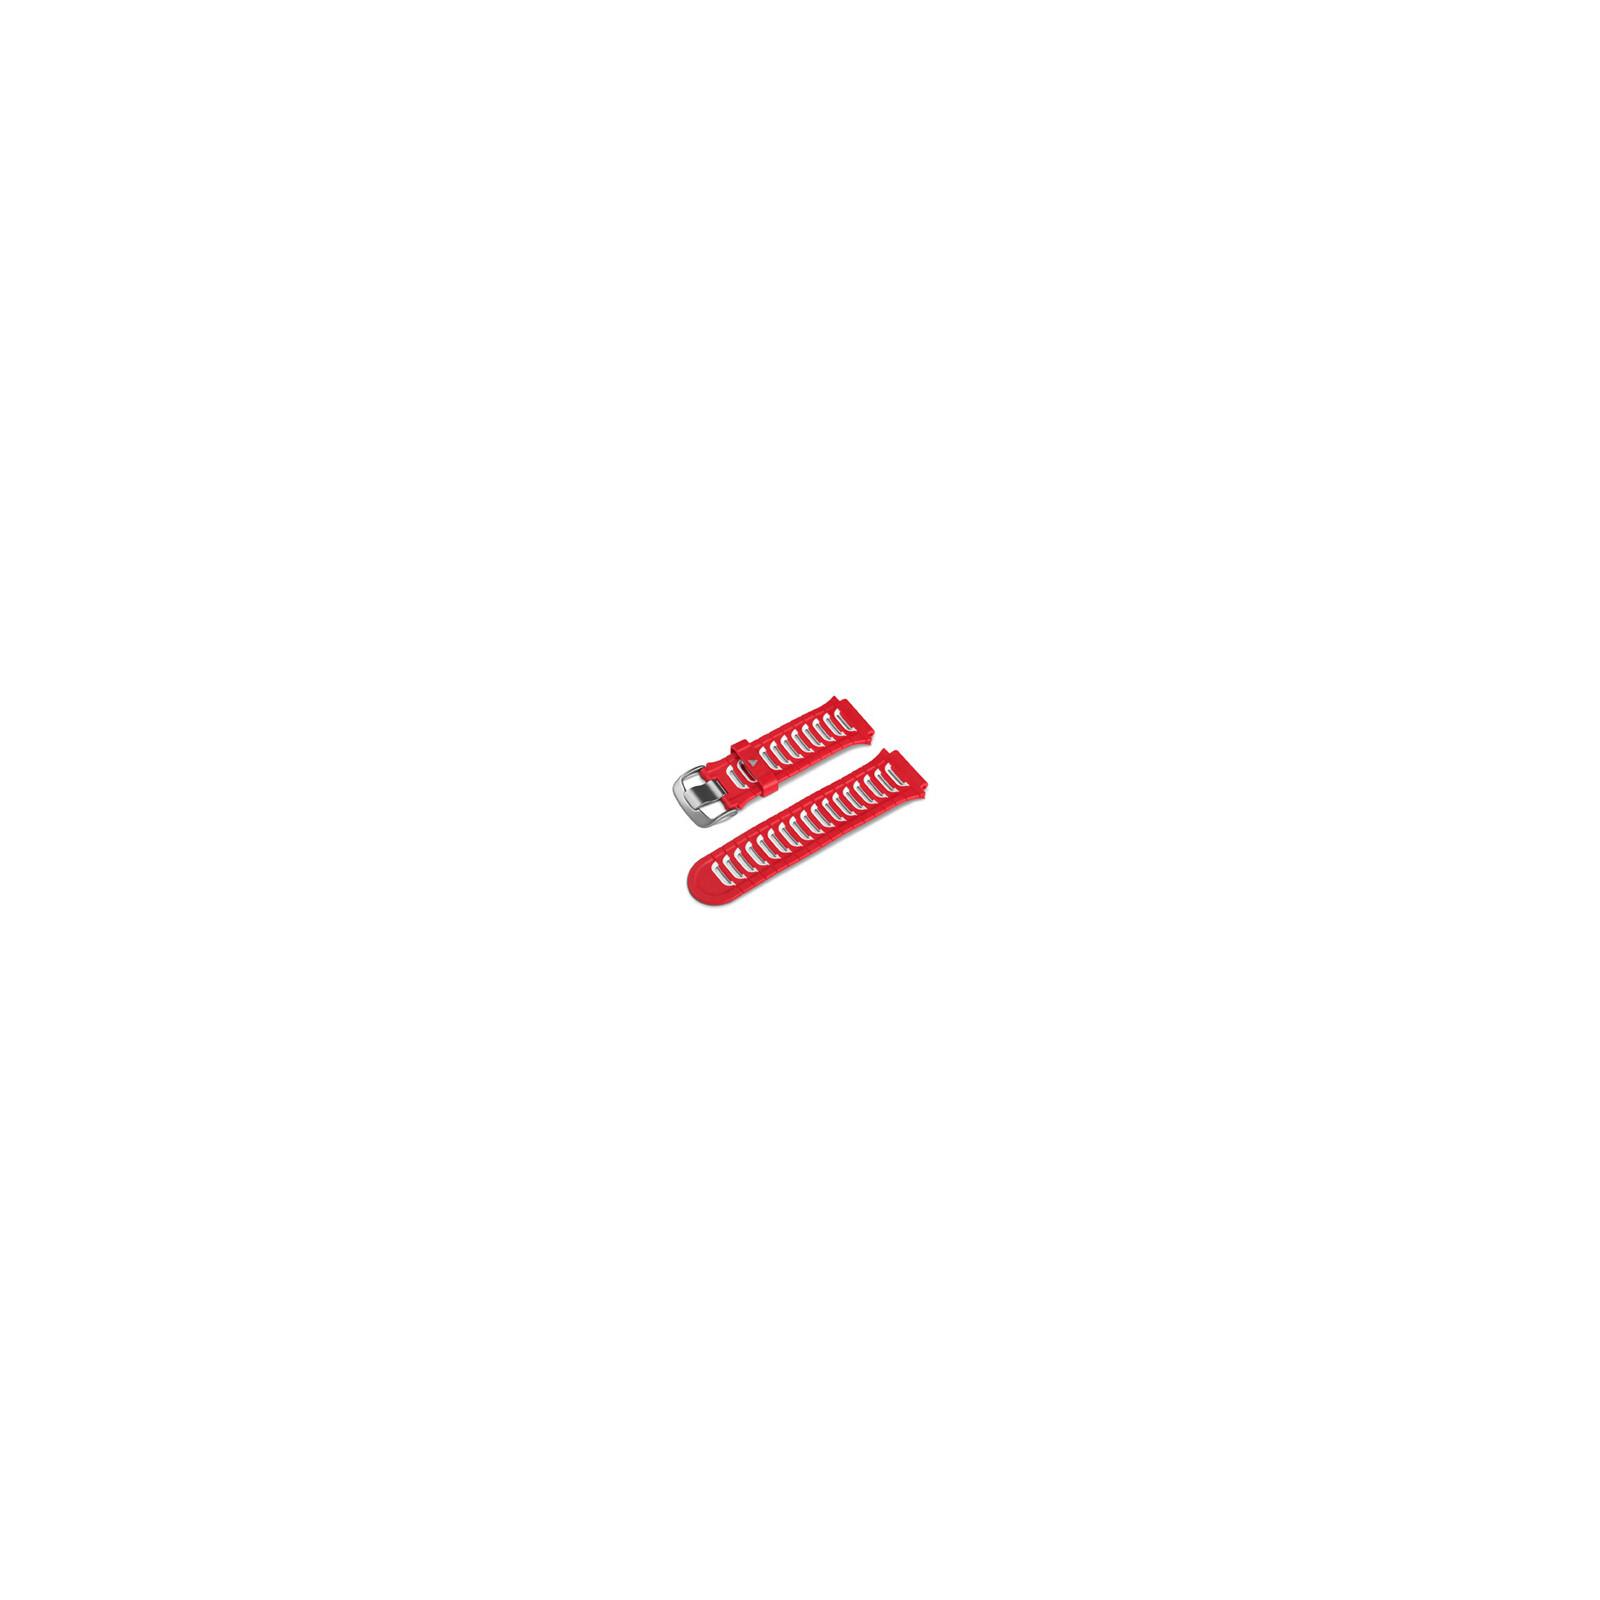 Garmin FR 920XT Ersatzband